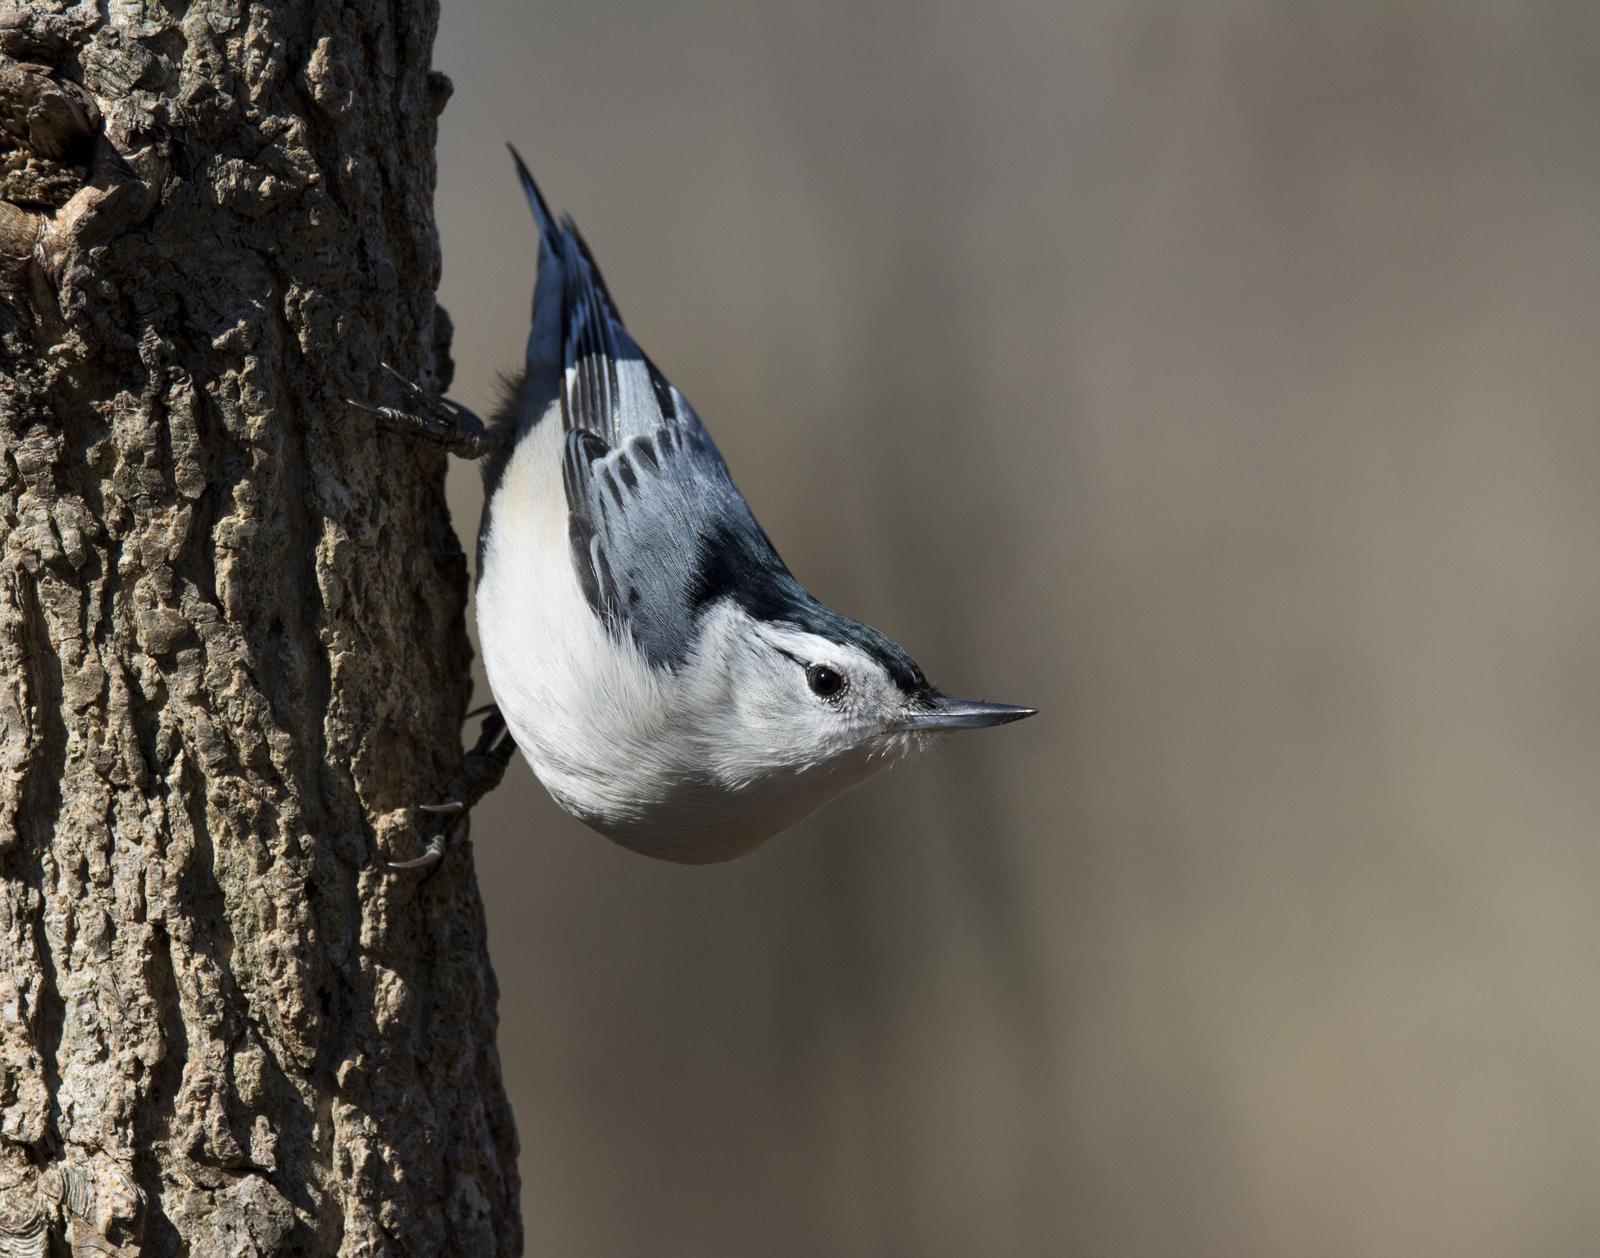 White-breasted Nuthatch Photo by Jacob Zadik